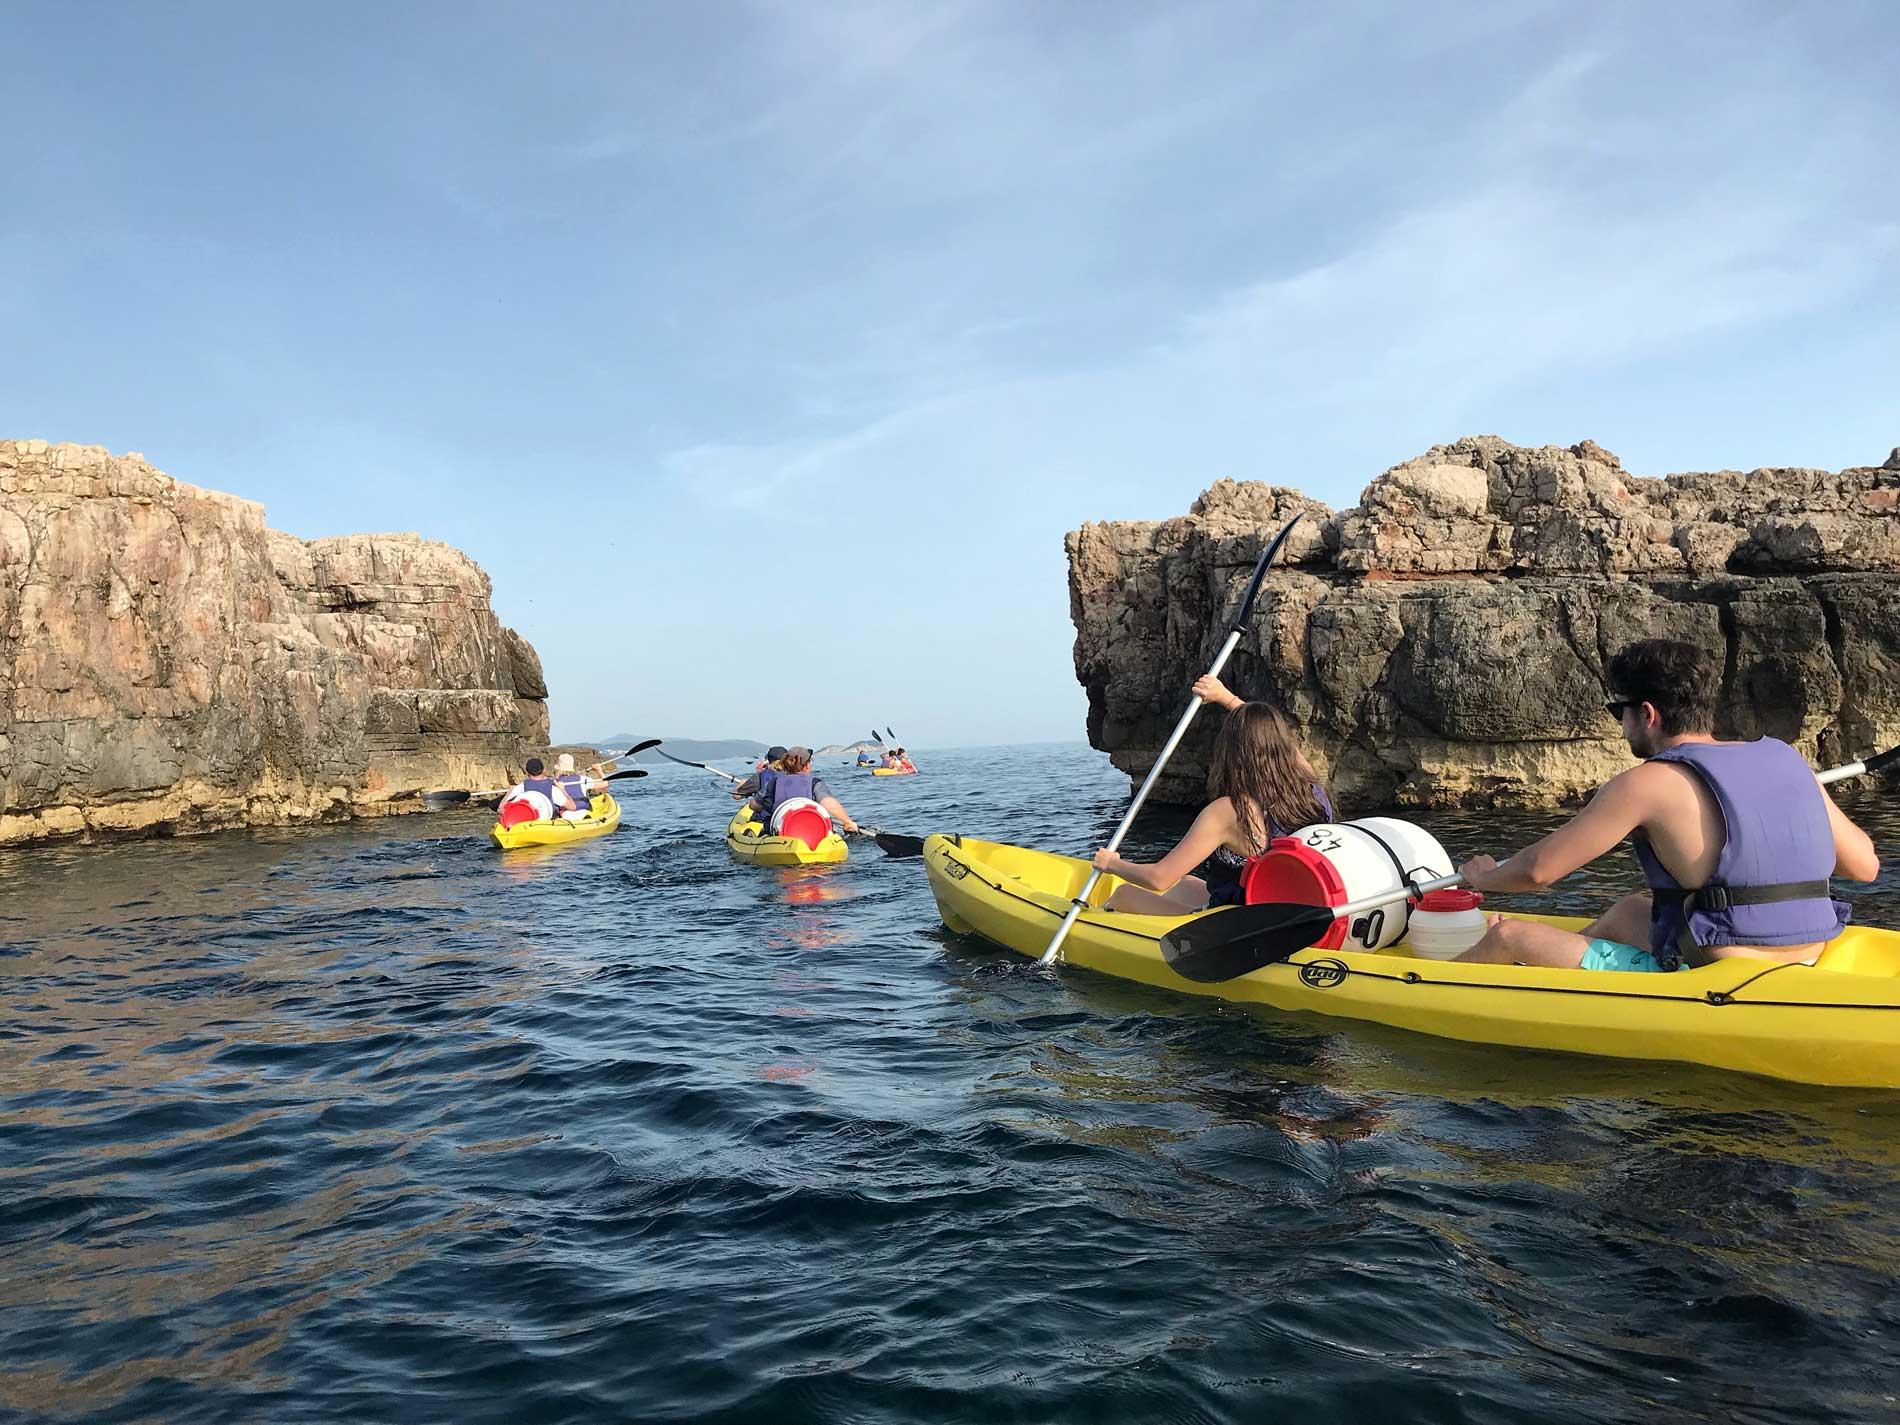 Dubrovnik-Croazia-mare-kayak-adventure-Dubrovnik